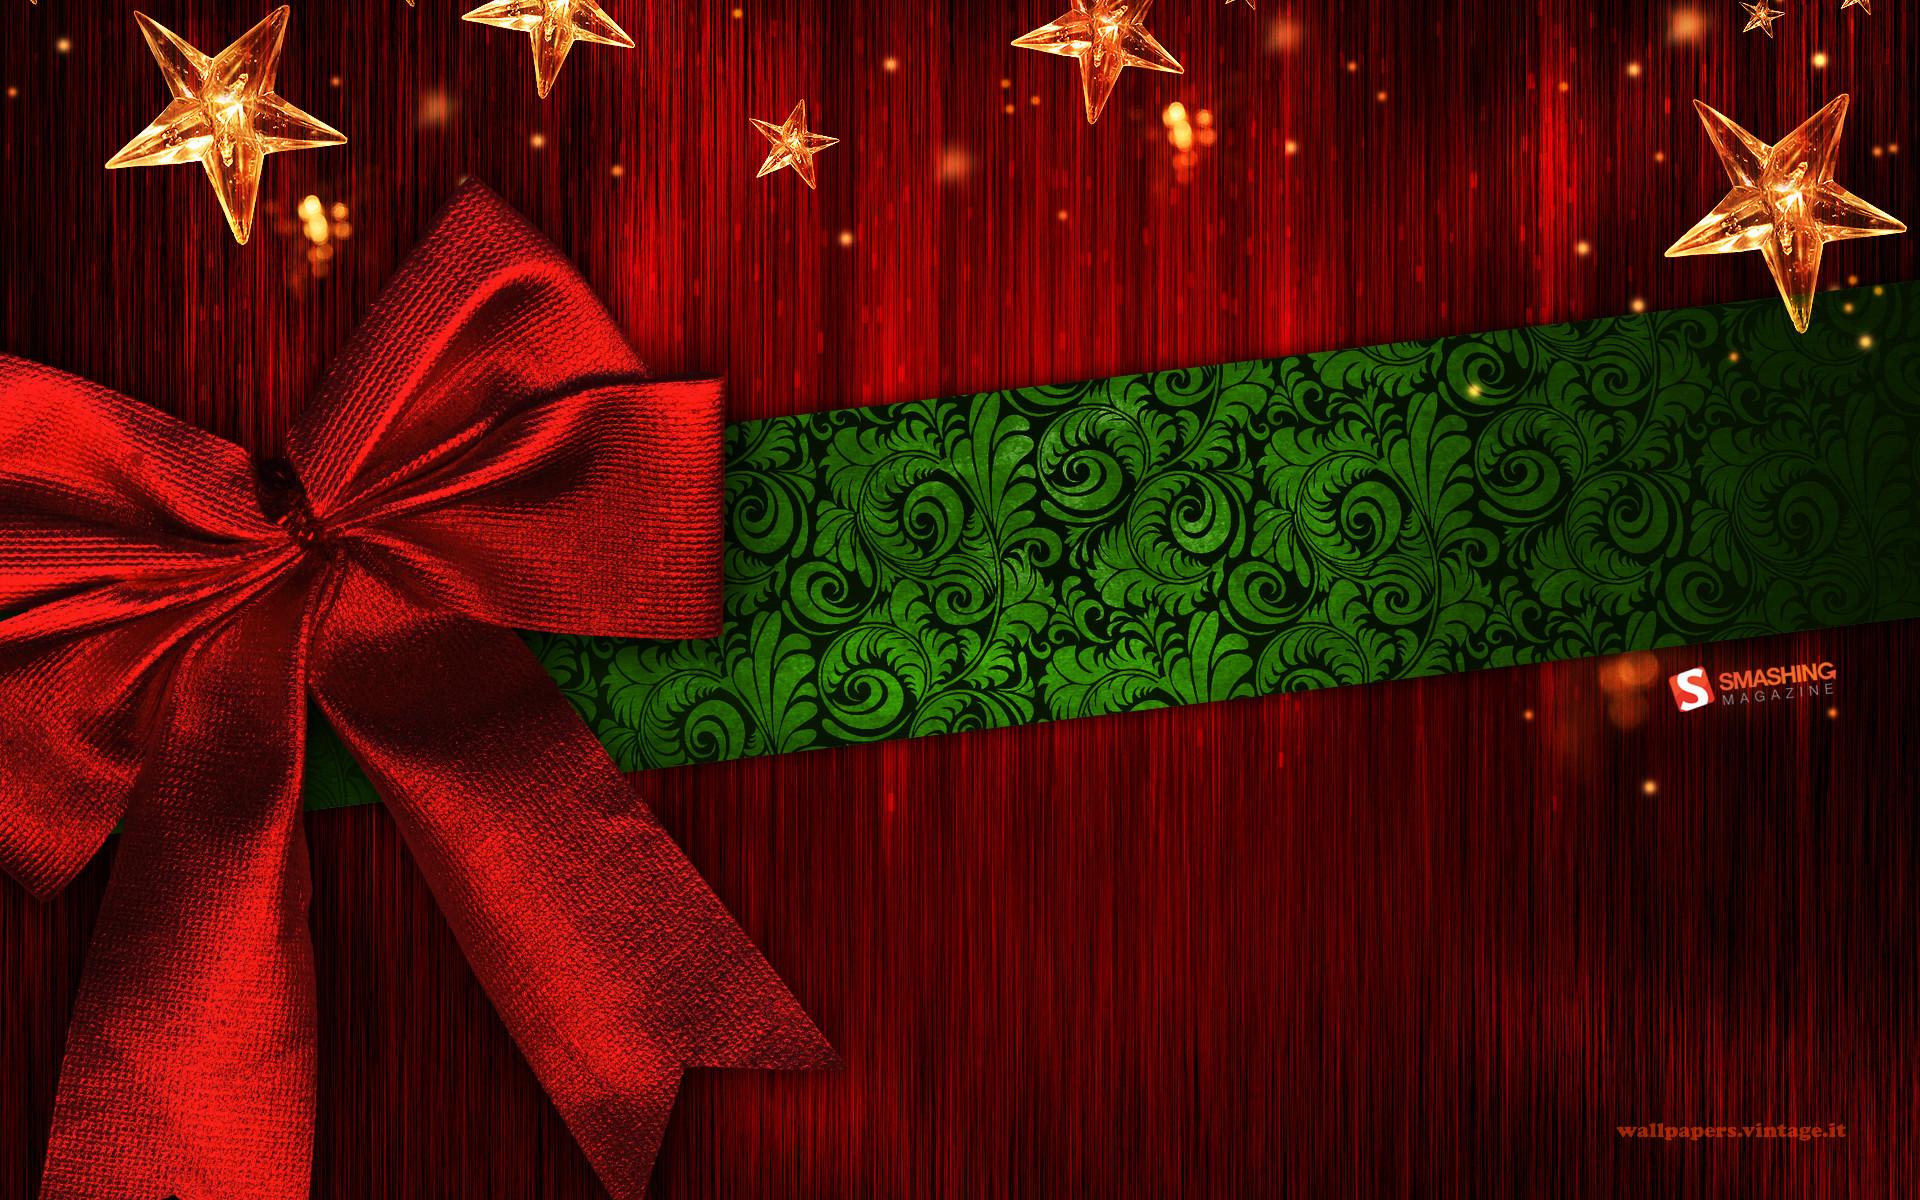 Stars and stripes – Christmas wallpaper